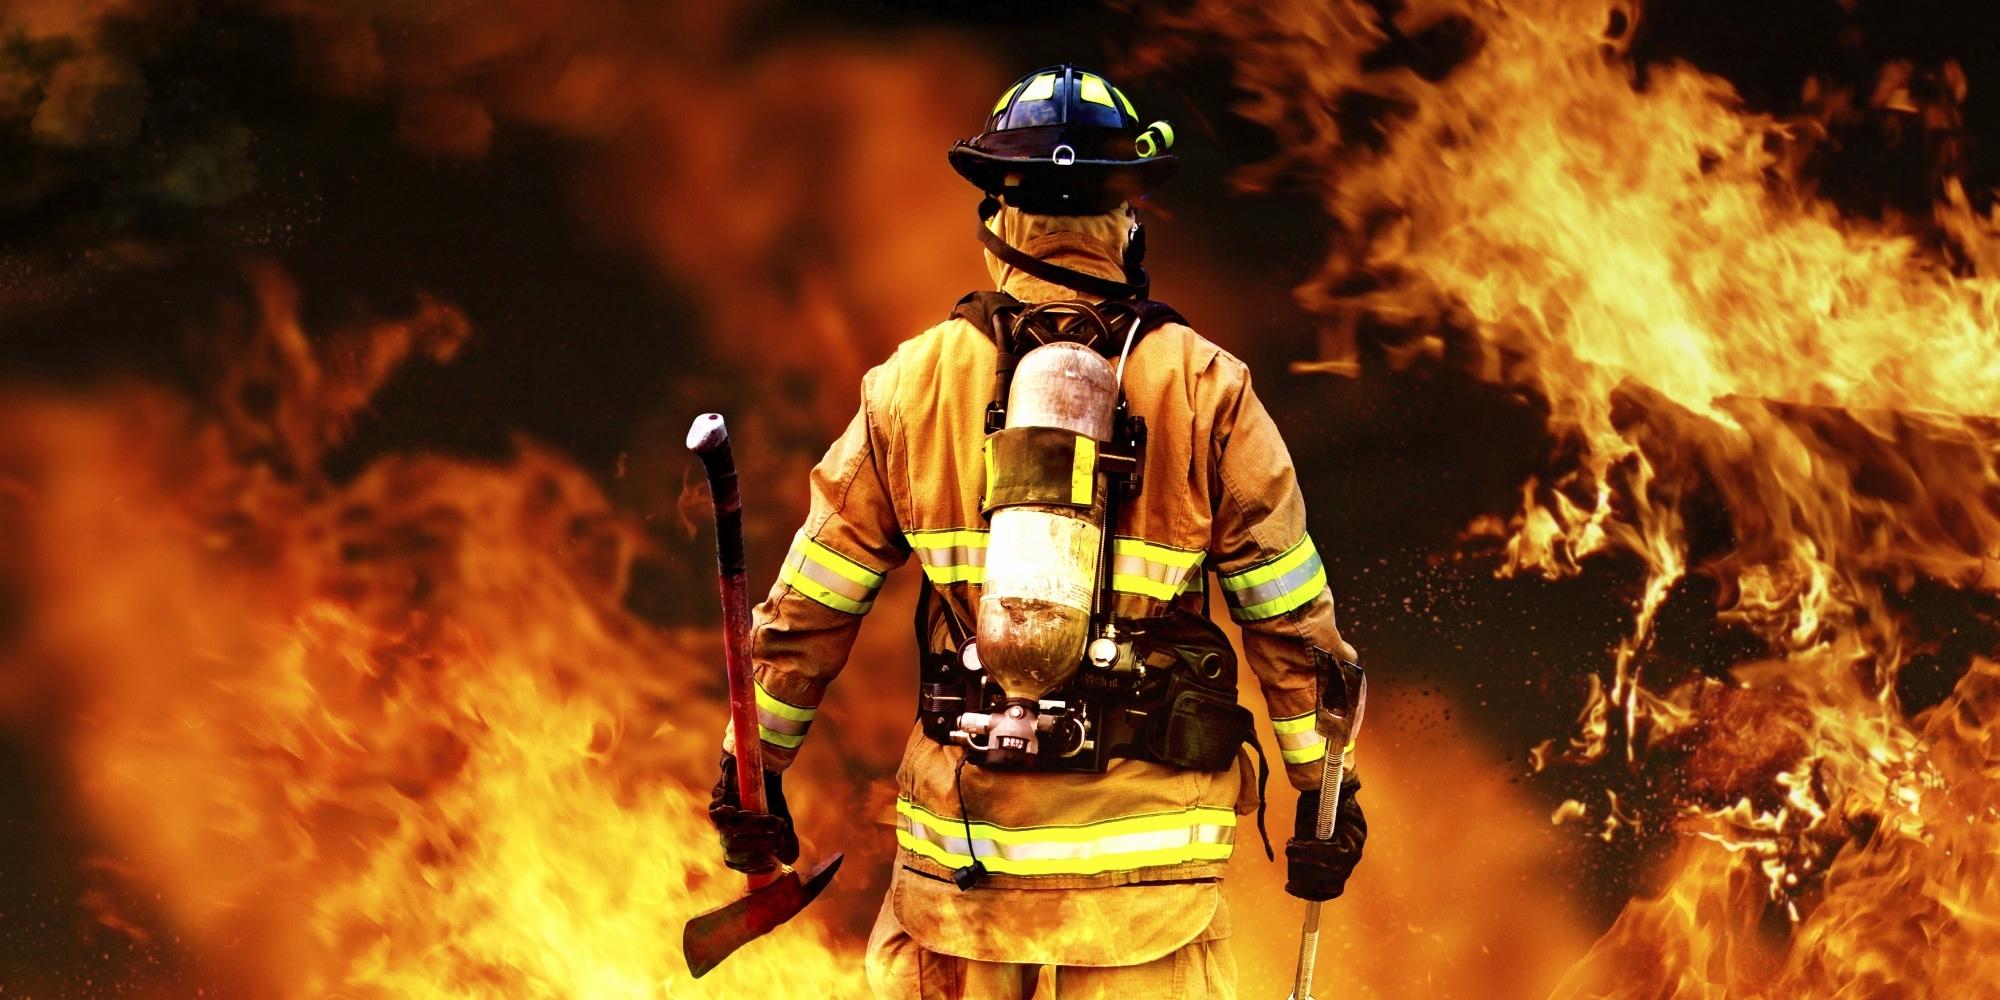 firefighter wallpaper luxury firefighter wallpapers men hq